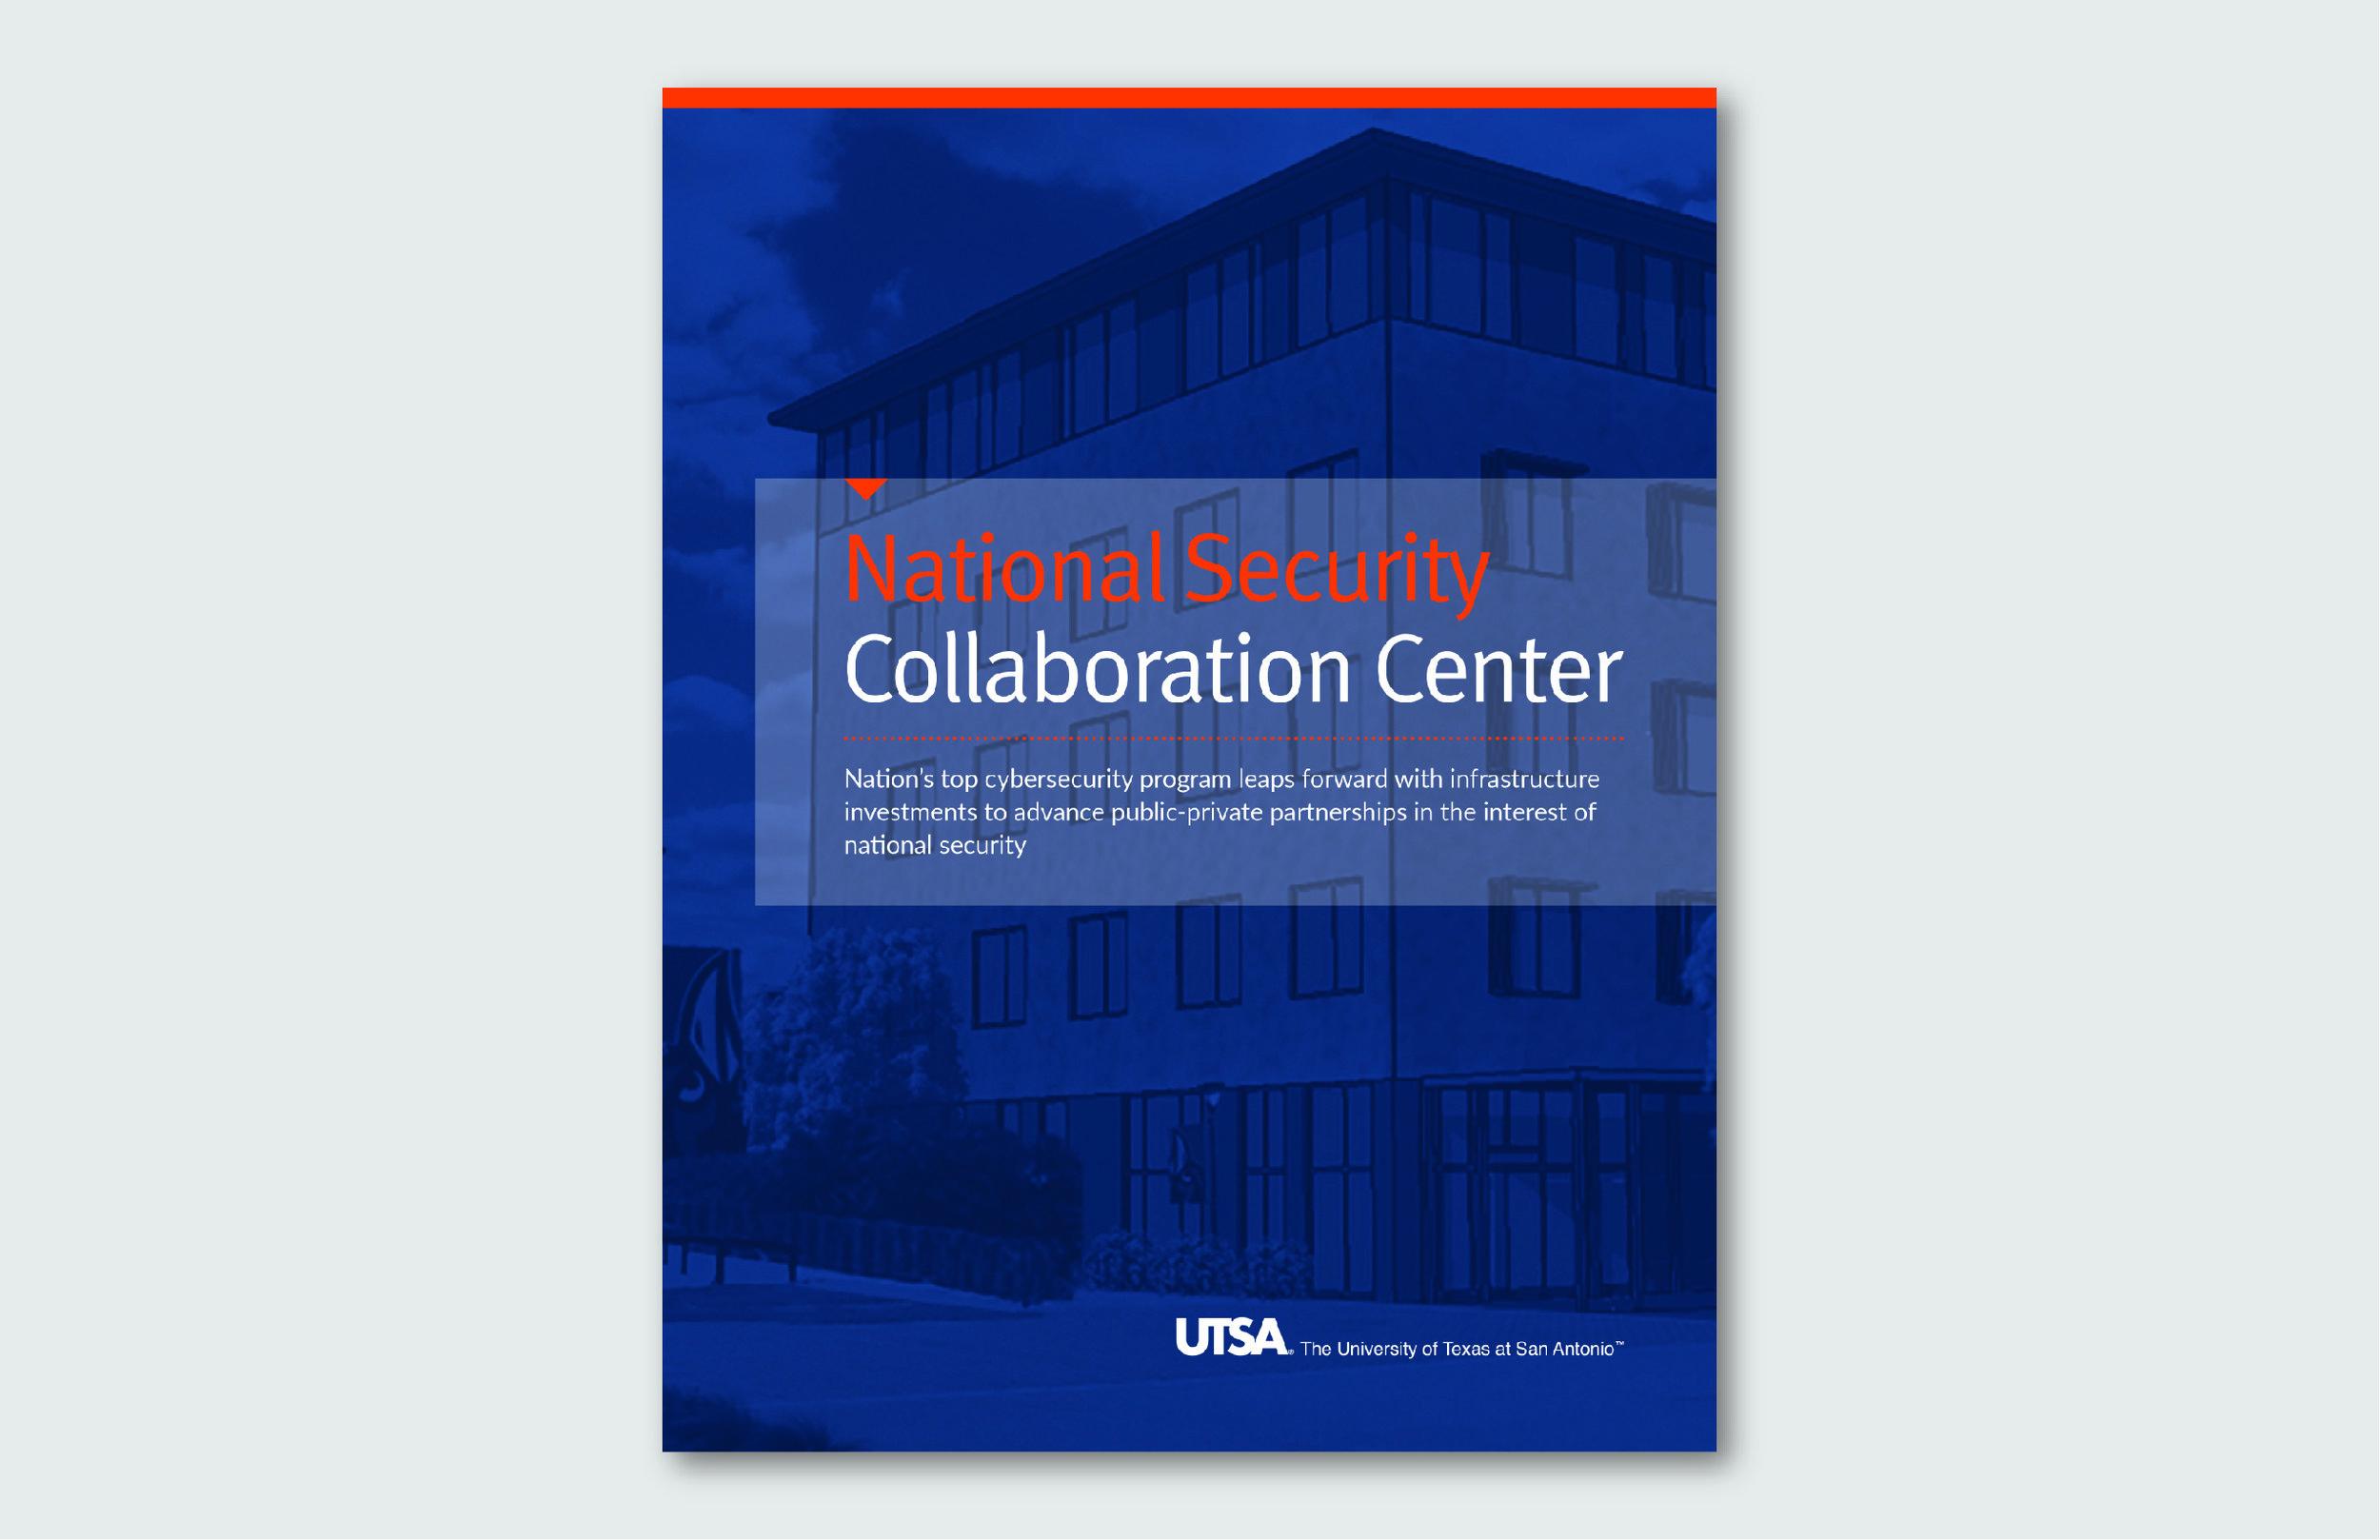 NSCC_booklet_cover-01.jpg